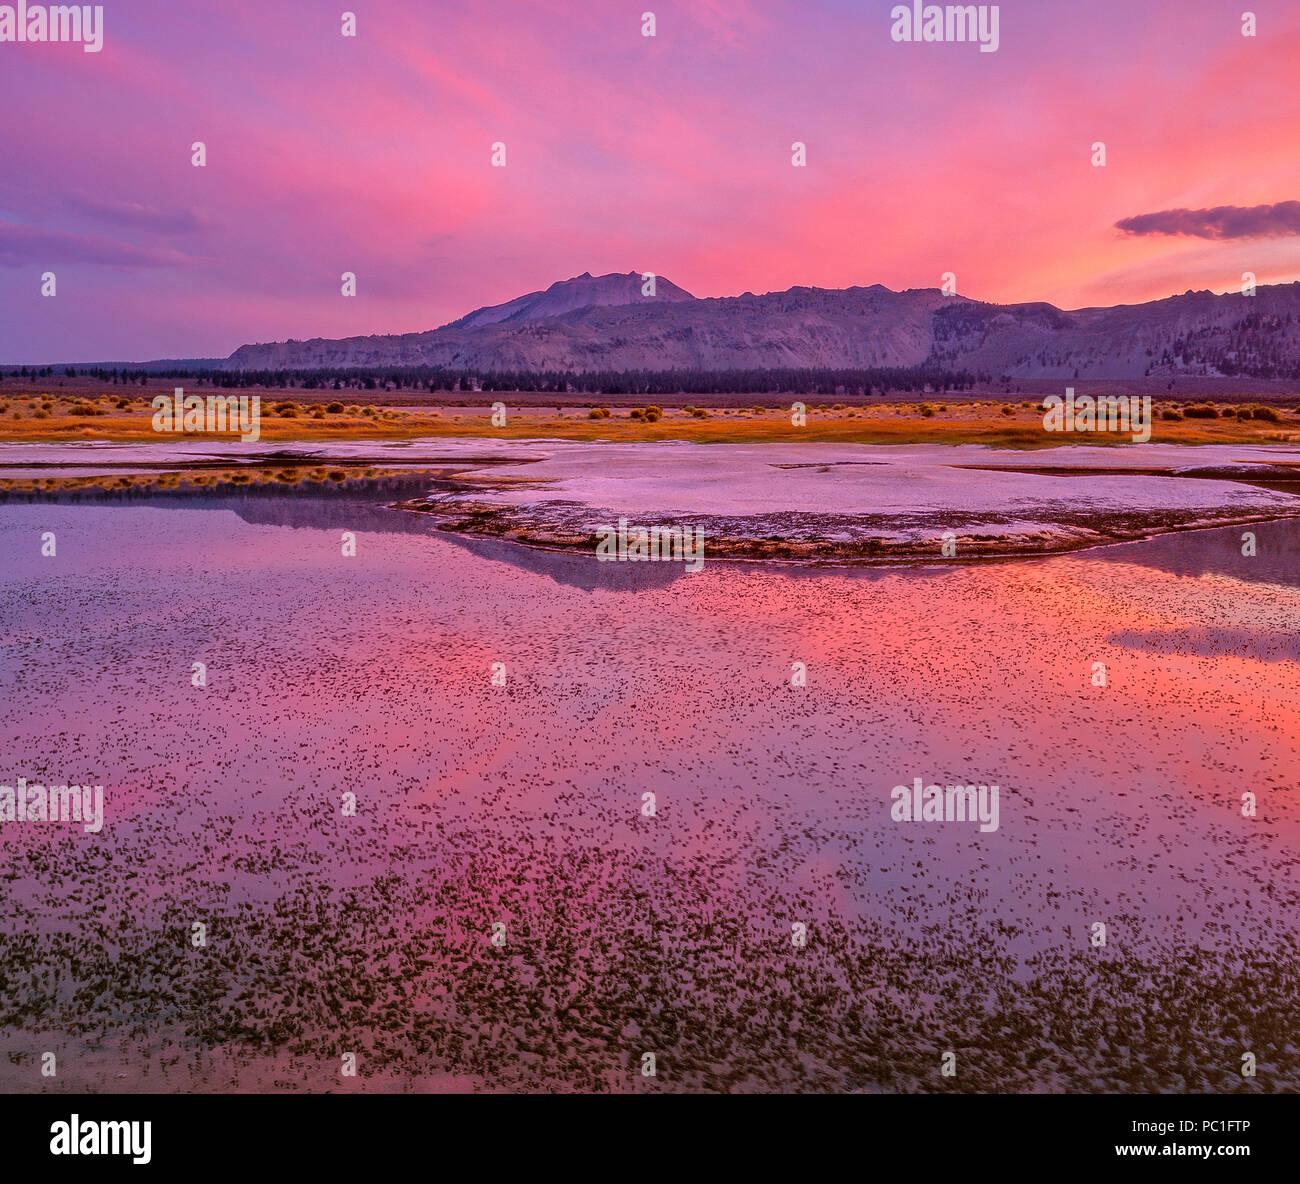 Dusk, Brineflies, Wetlands, Mono Lake, Mono Basin National Forest Scenic Area, Inyo National Forest, California - Stock Image